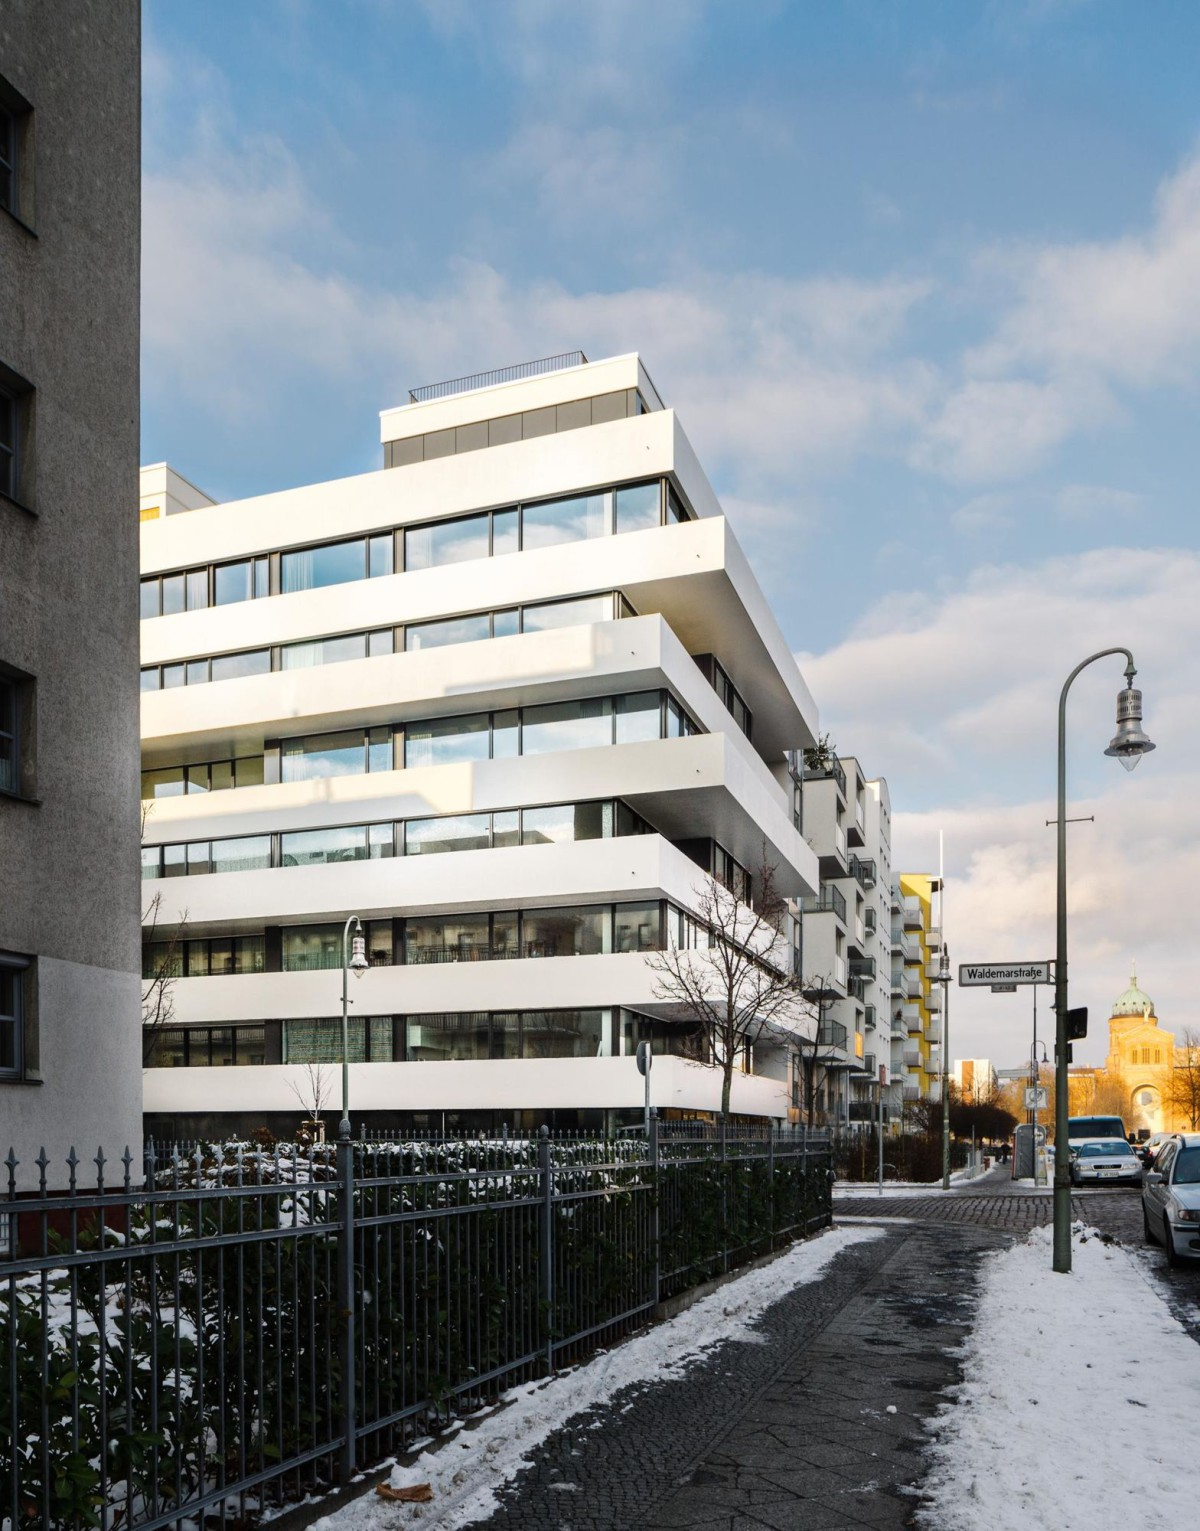 zanderroth . WA17  WALDEMARSTRASSE RESIDENTIAL BUILDING . BERLIN (1)